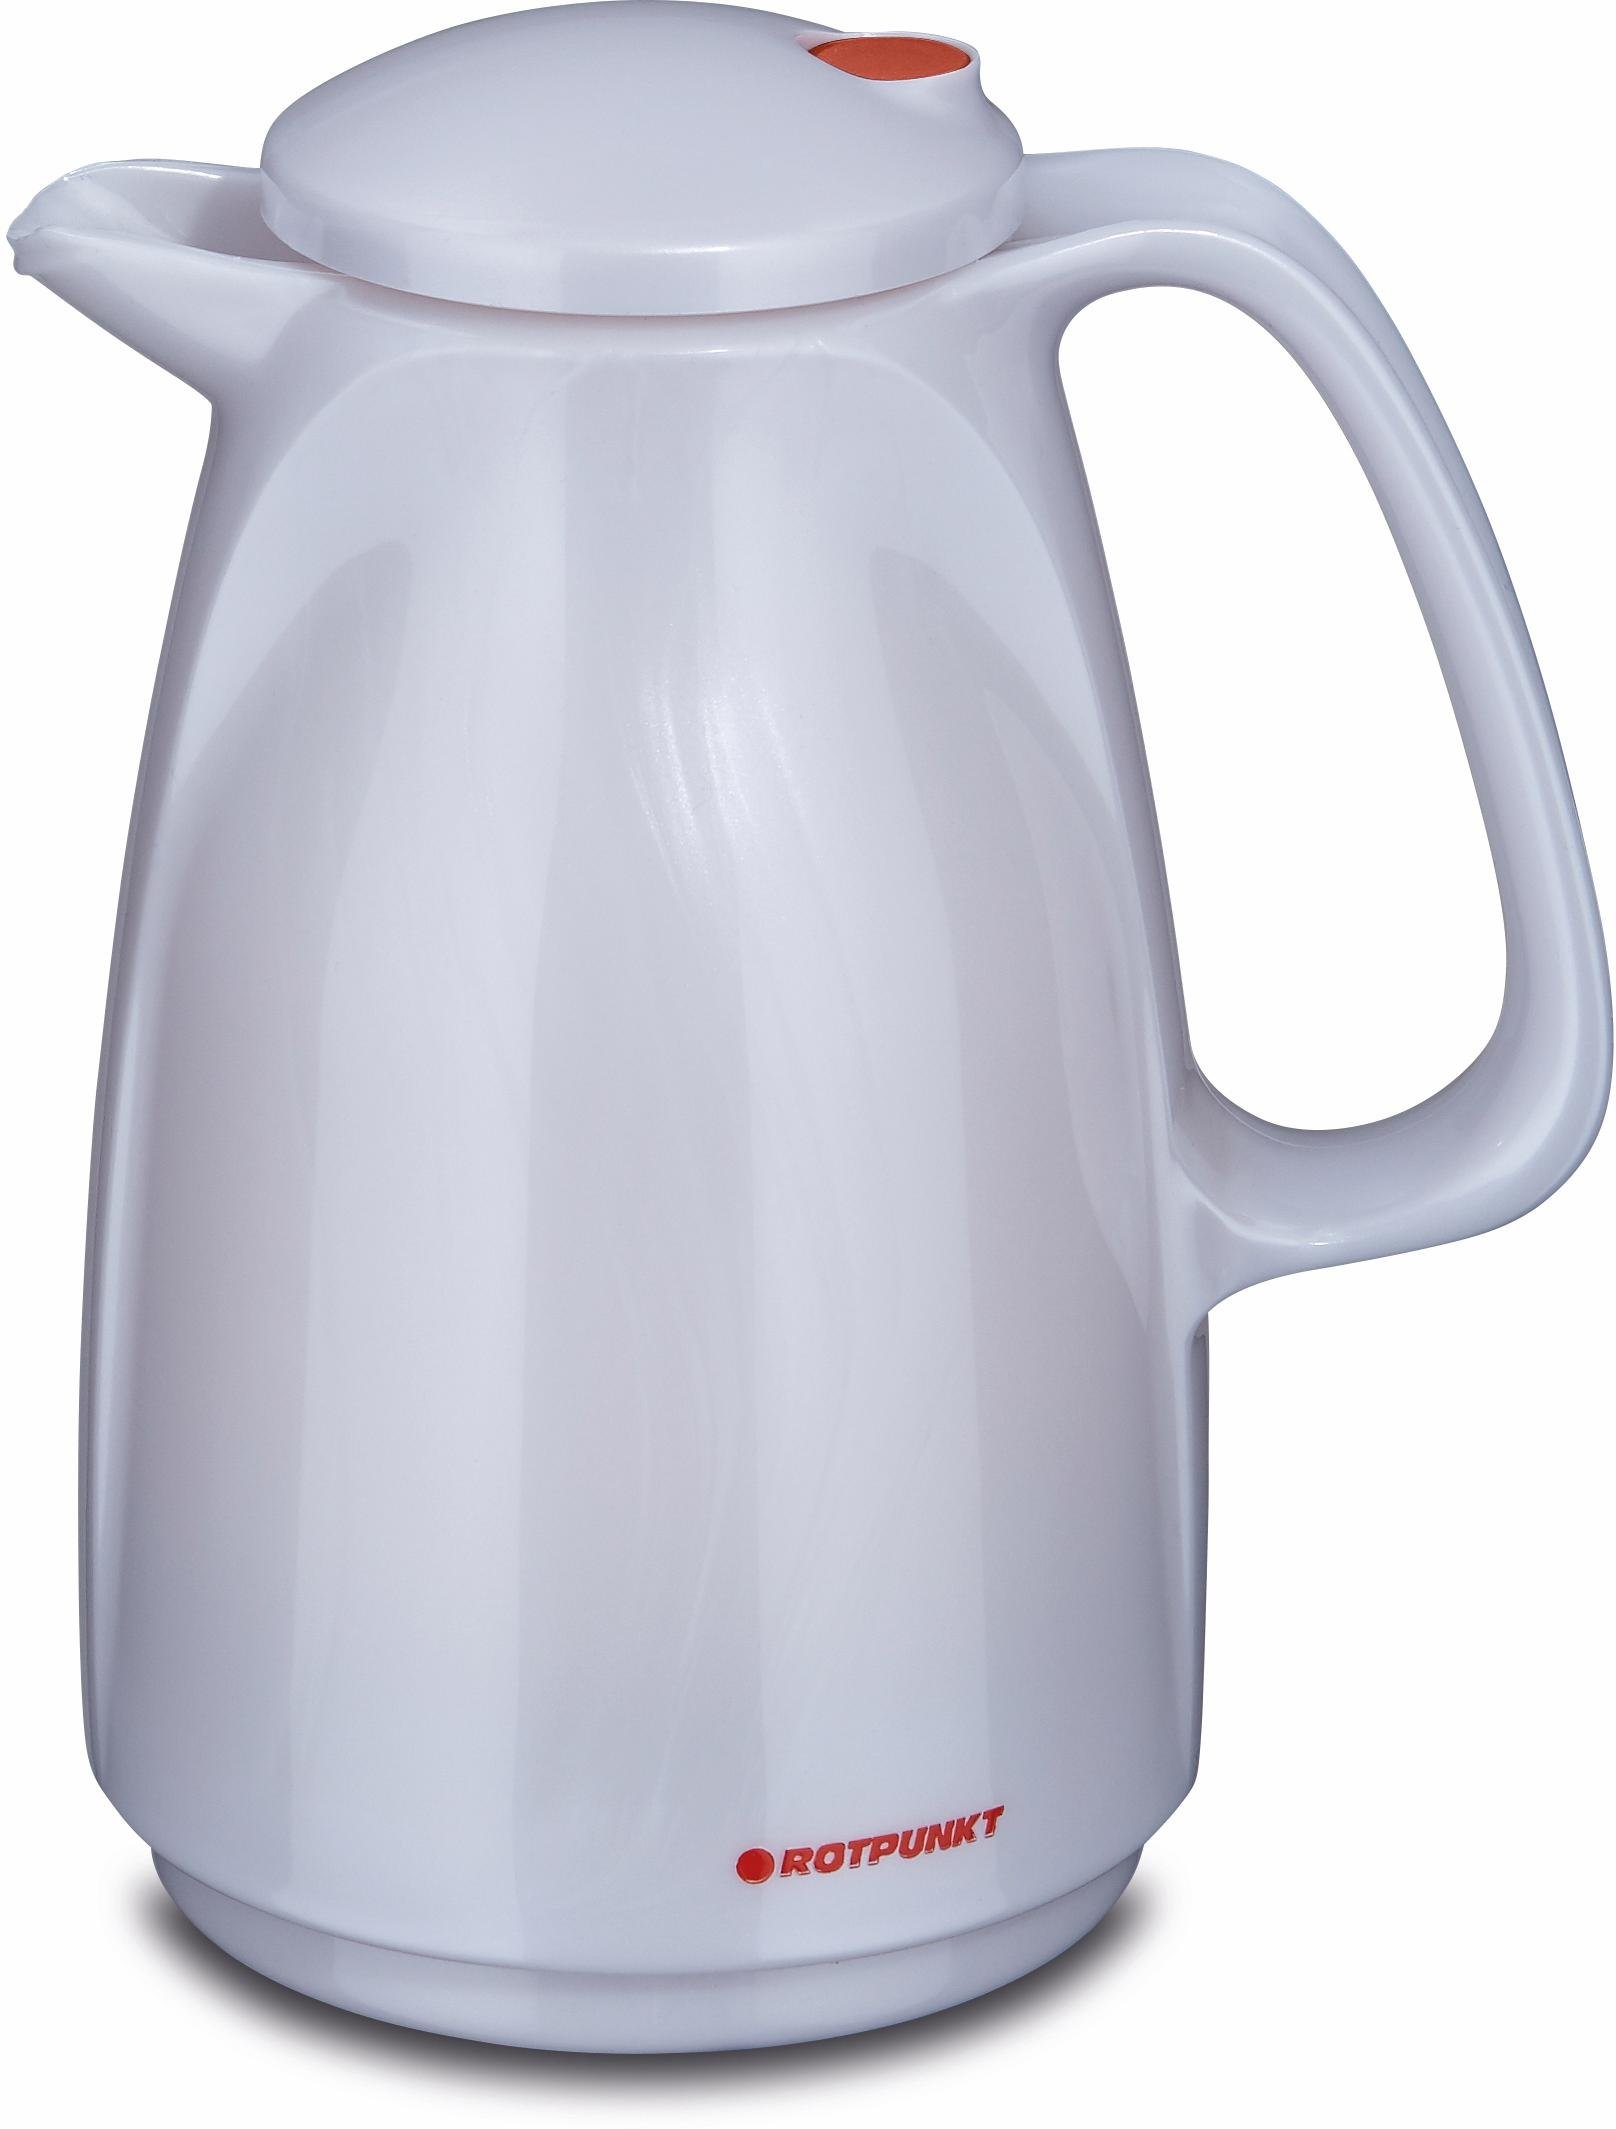 Rotpunkt thermoskan »Shiny White« voordelig en veilig online kopen